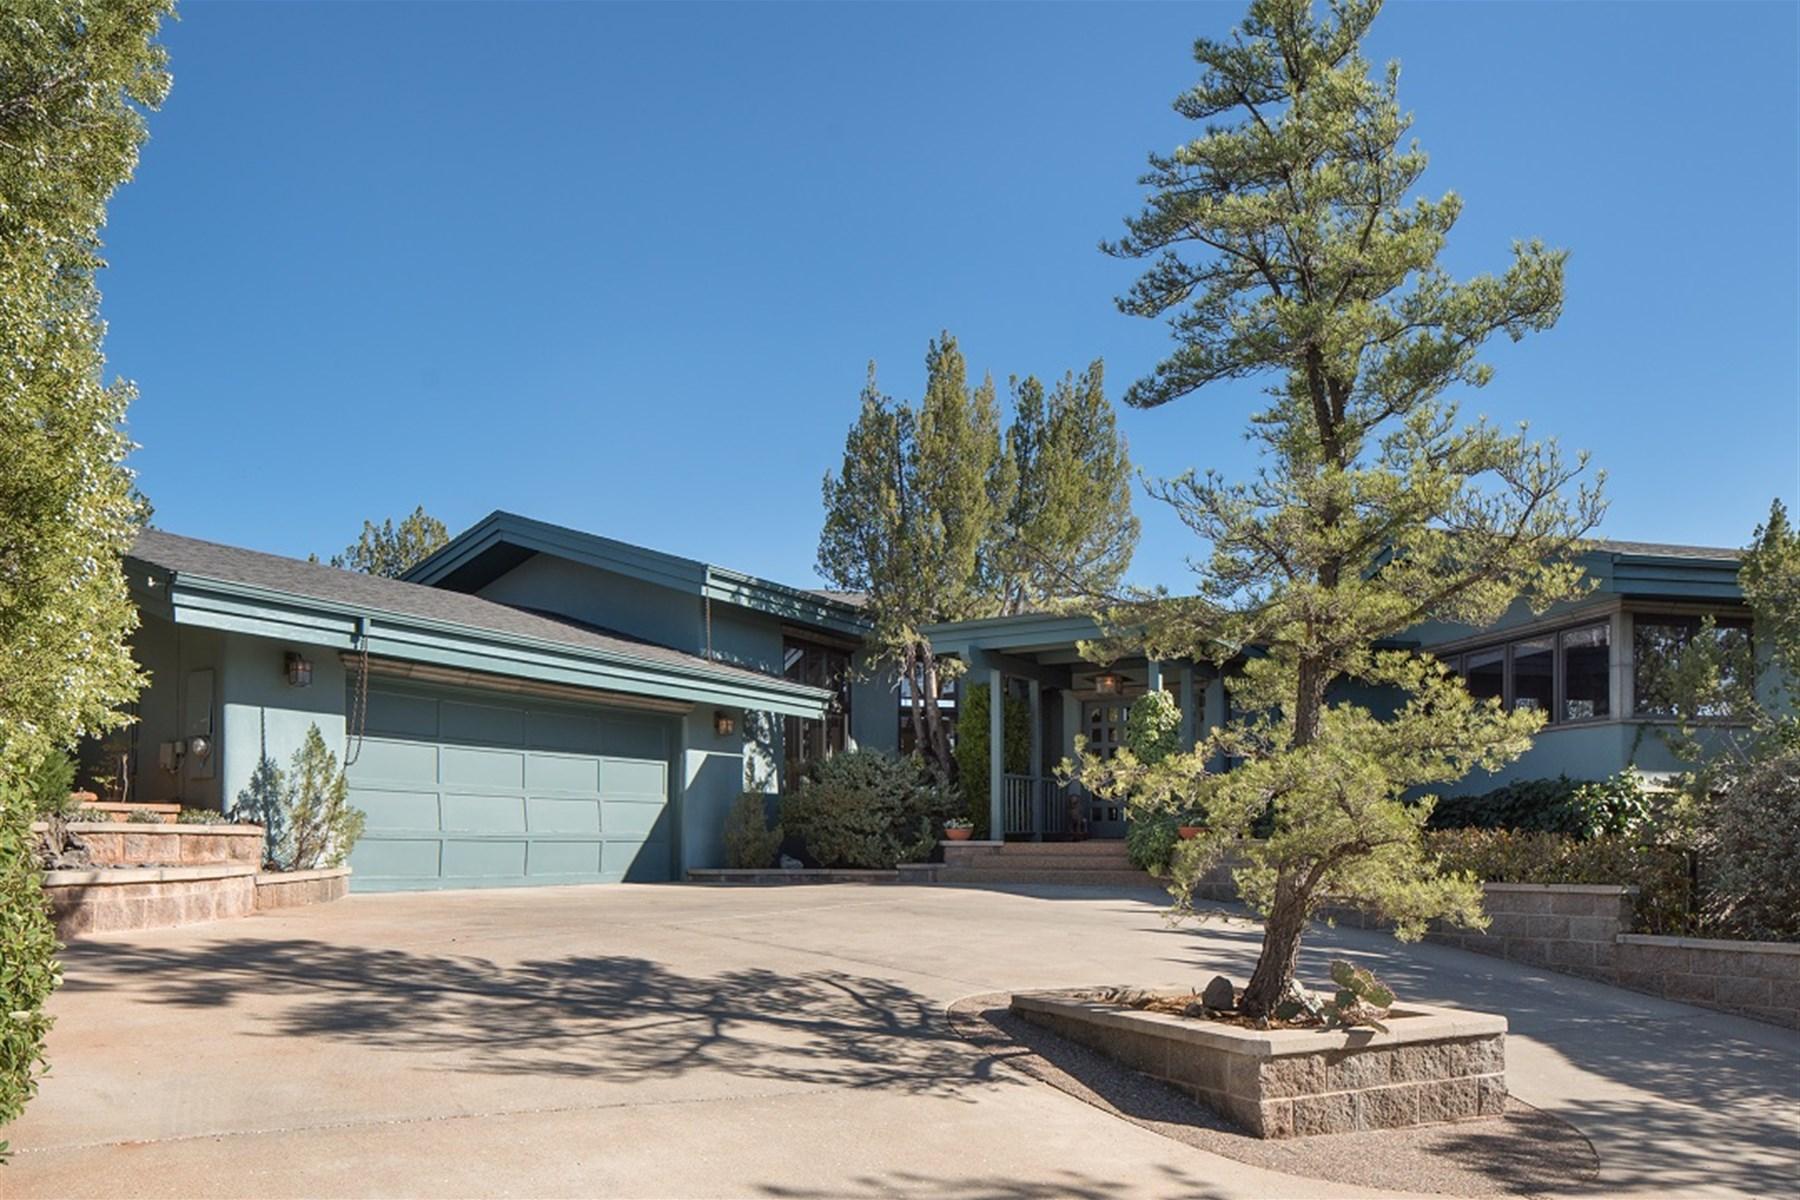 Single Family Home for Sale at Lovely home in Sedona 3223 Calle Del Montana Sedona, Arizona, 86336 United States